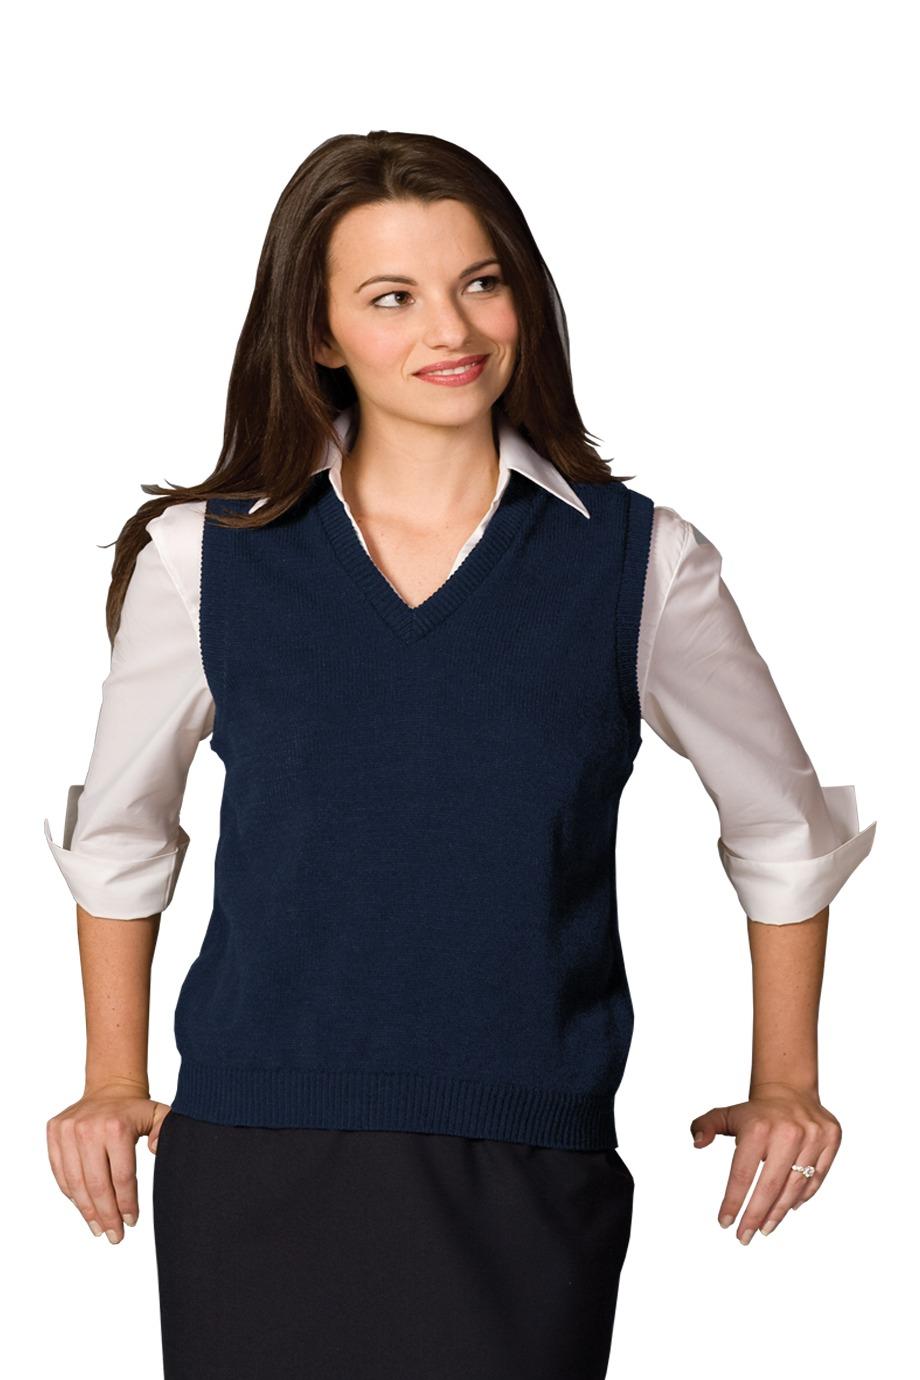 Edwards Garment 461 - Women's V-Neck Vest